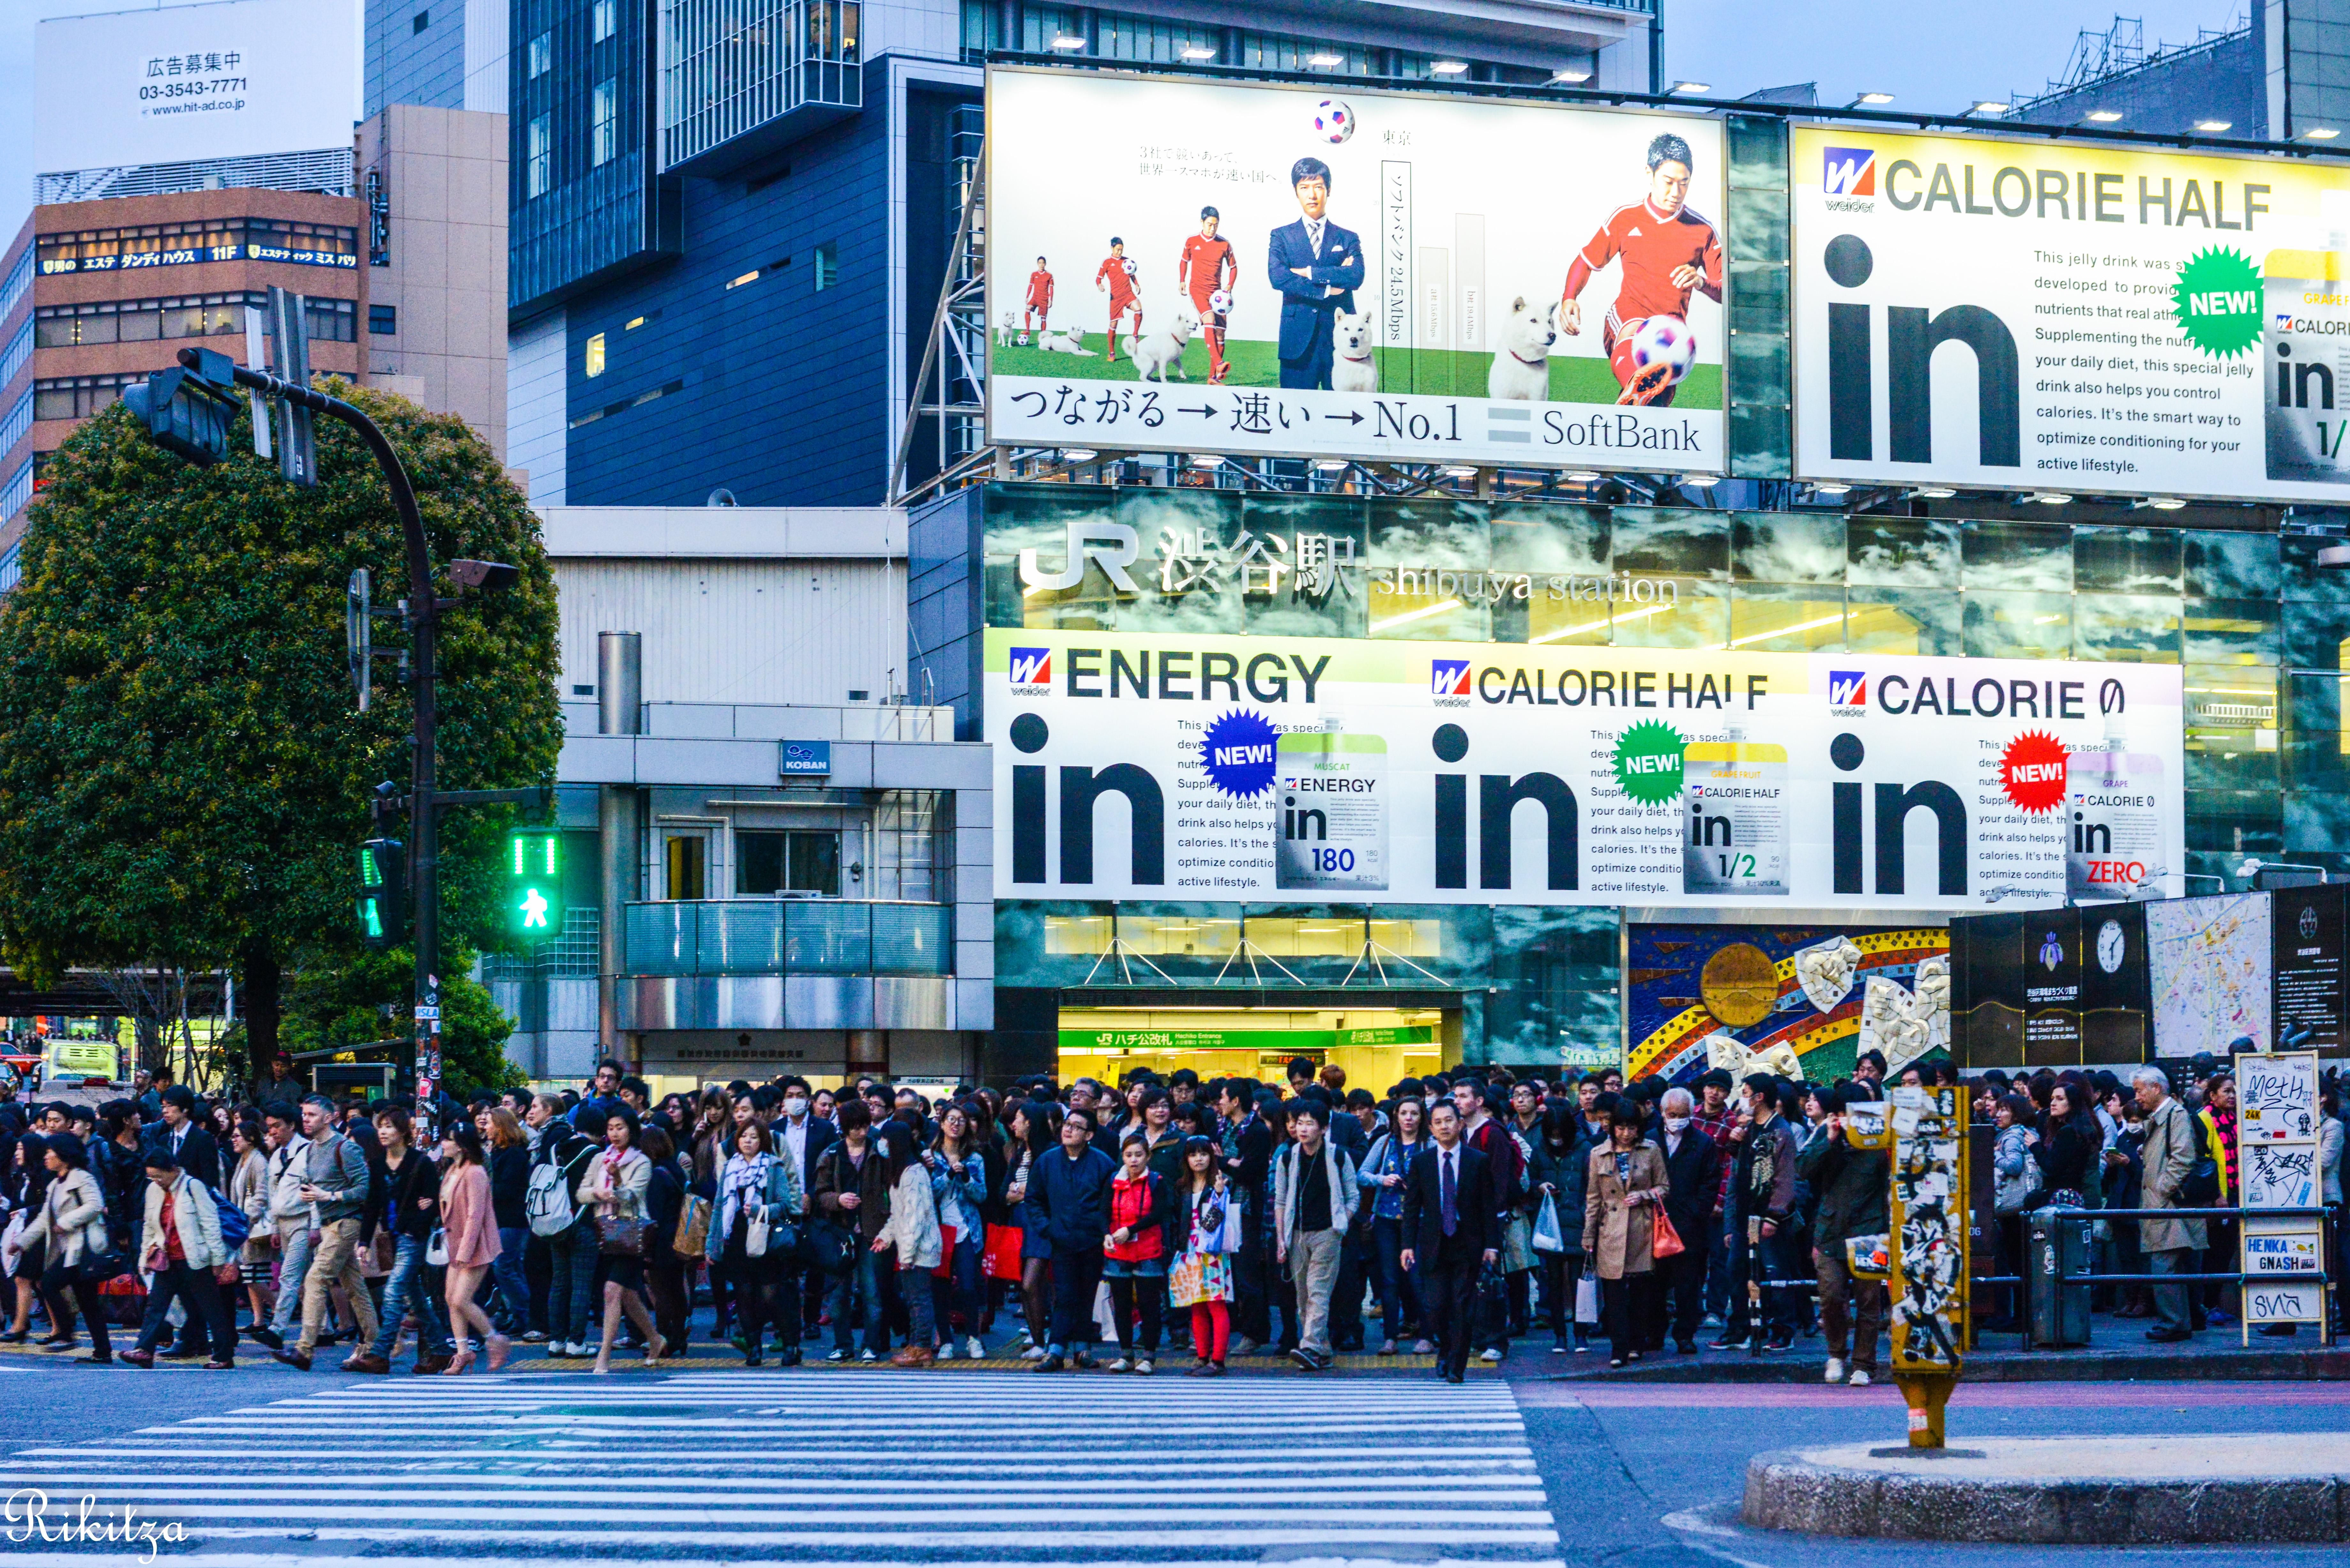 zebra crossing in Tokyo by Rikitza